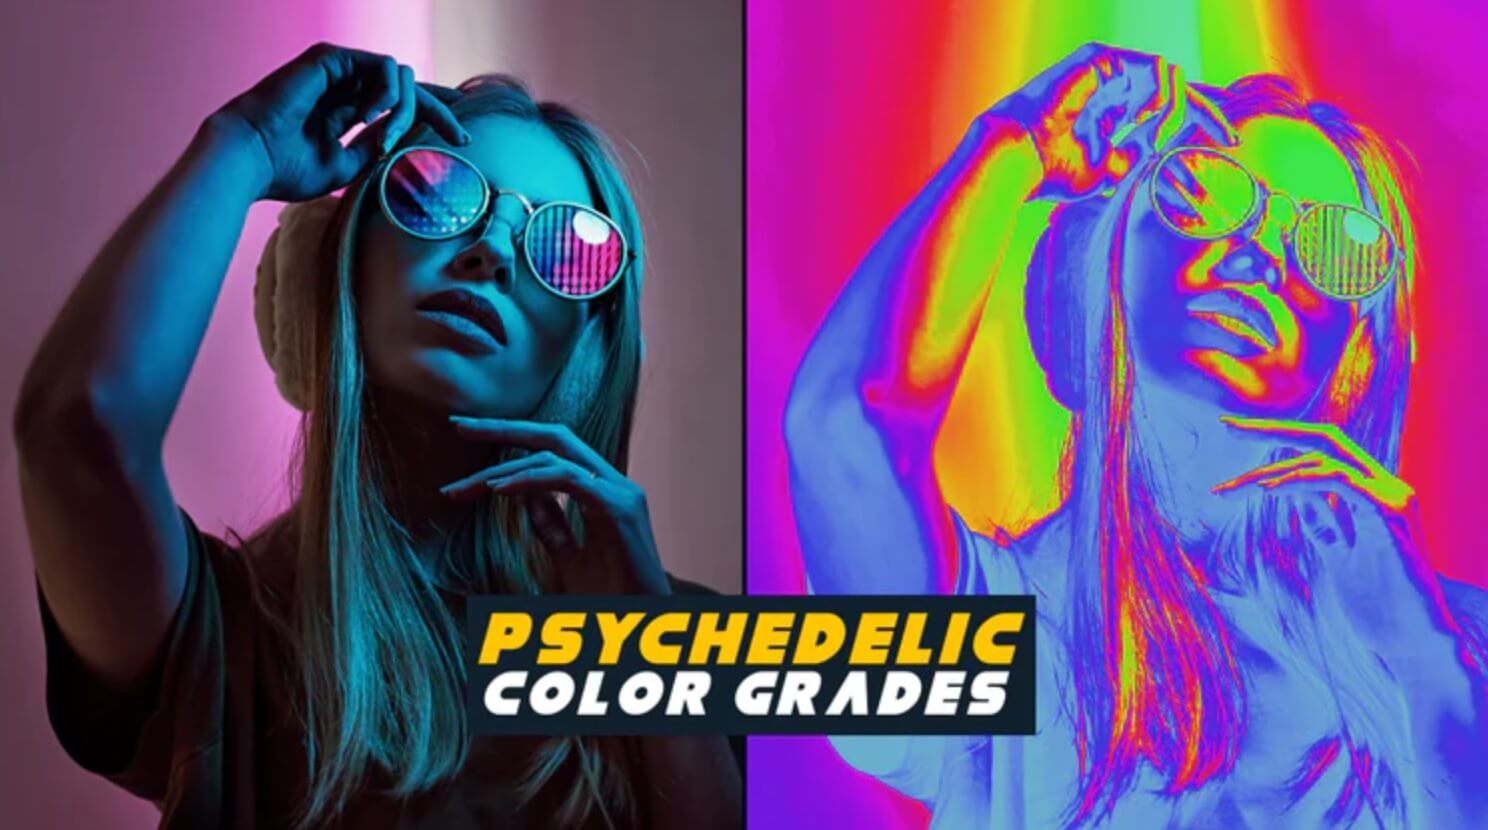 LUTs预设 20组红外热成像效果迷幻色彩调色预设 Psychedelic Color Grades